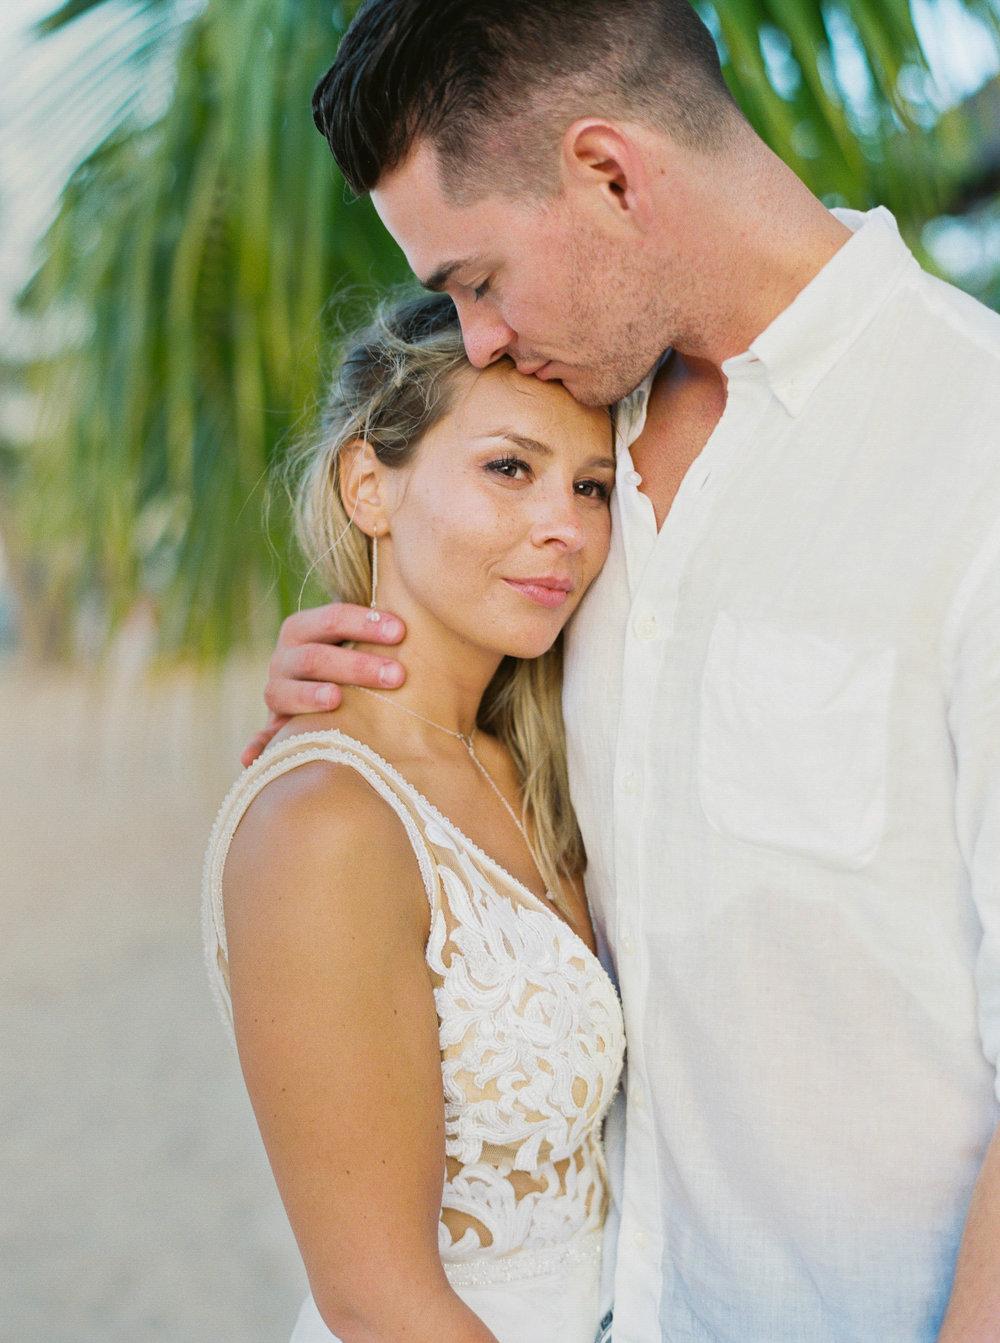 Moorea_Wedding_Elopement_Photographer_Videographer_153.jpg